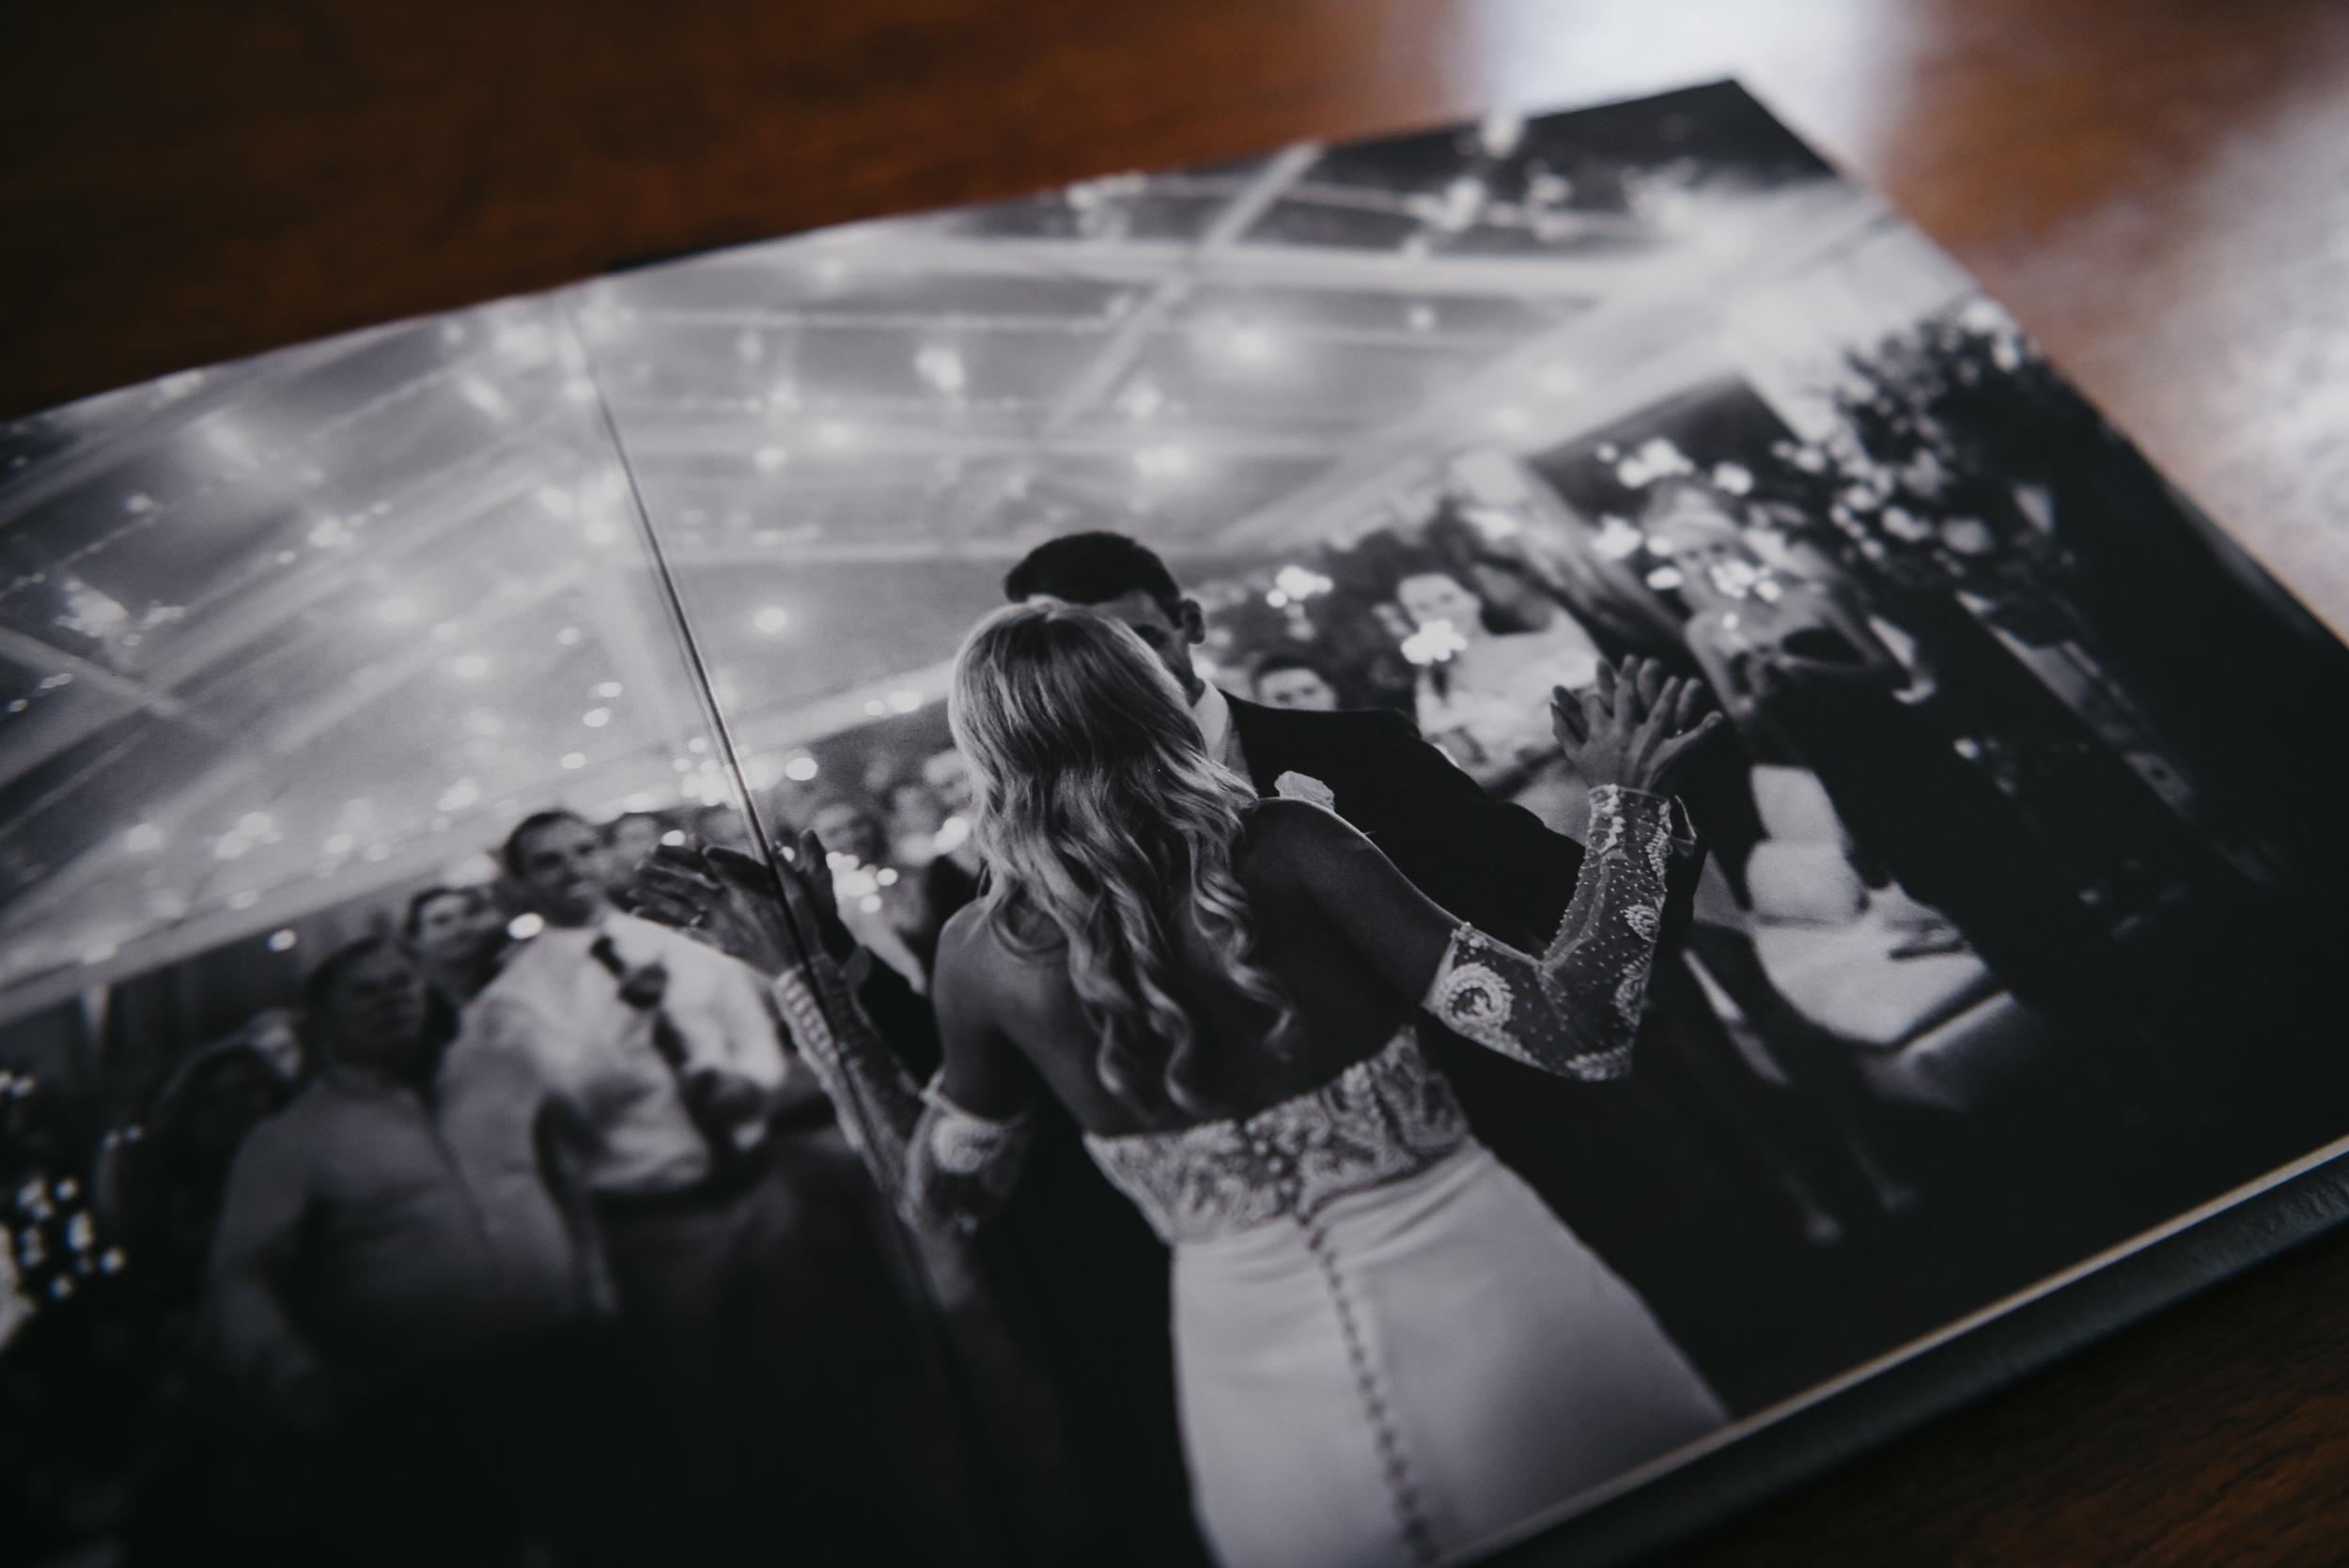 Fine_art_wedding_album_jason_corroto-Photo (9 of 11).jpg